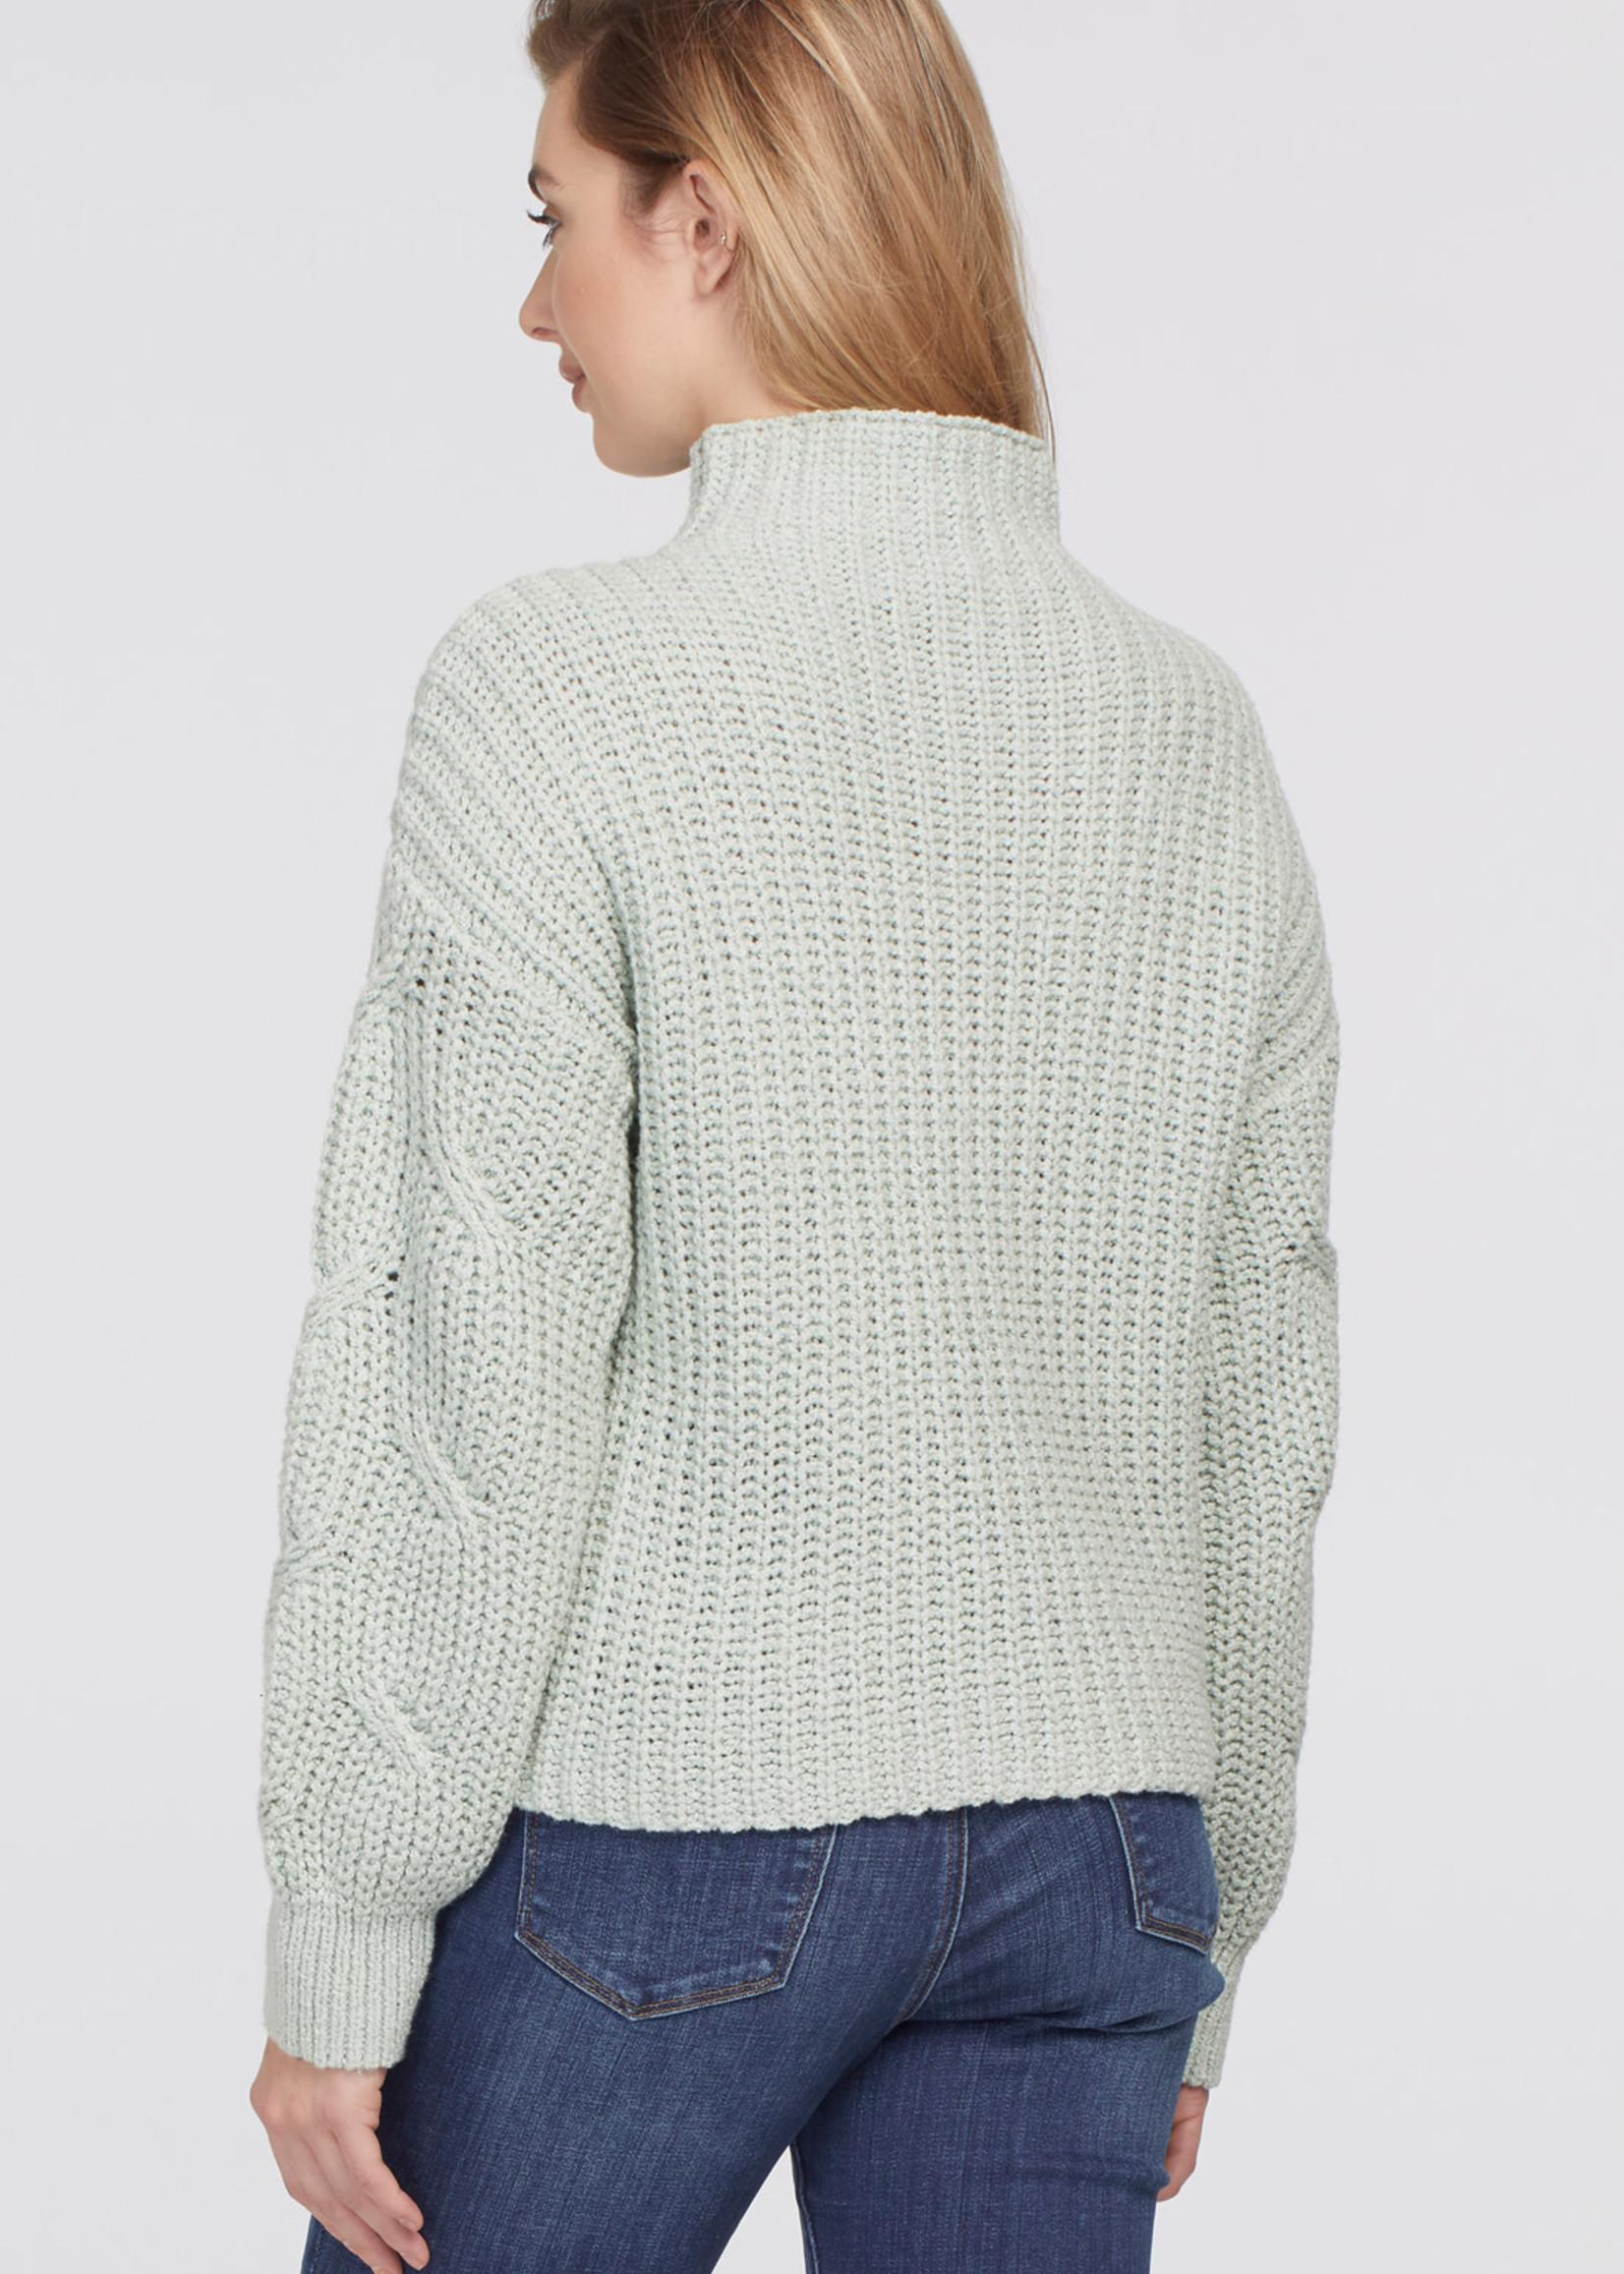 Tribal Tribal High Neck Oversize Sweater Mint